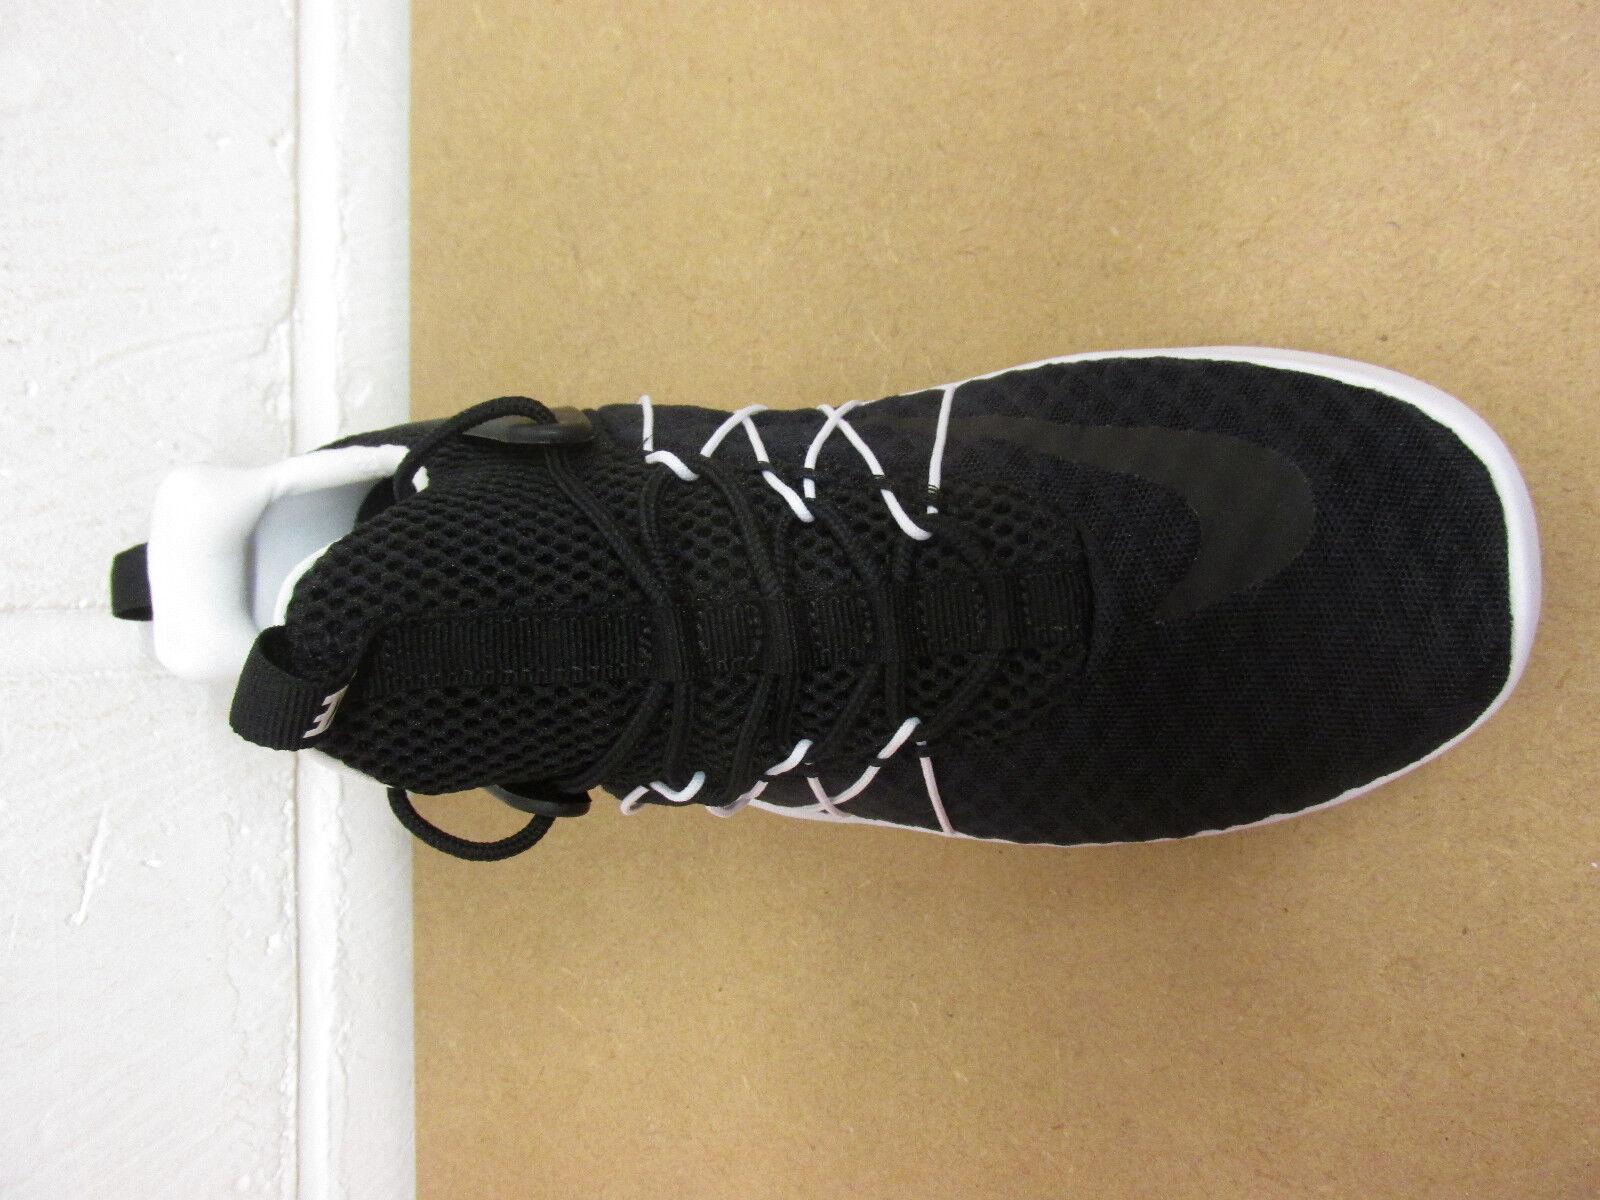 Nike Damen Darwin 819959 Laufschuhe 819959 Darwin 003 Turnschuhe a9fafc